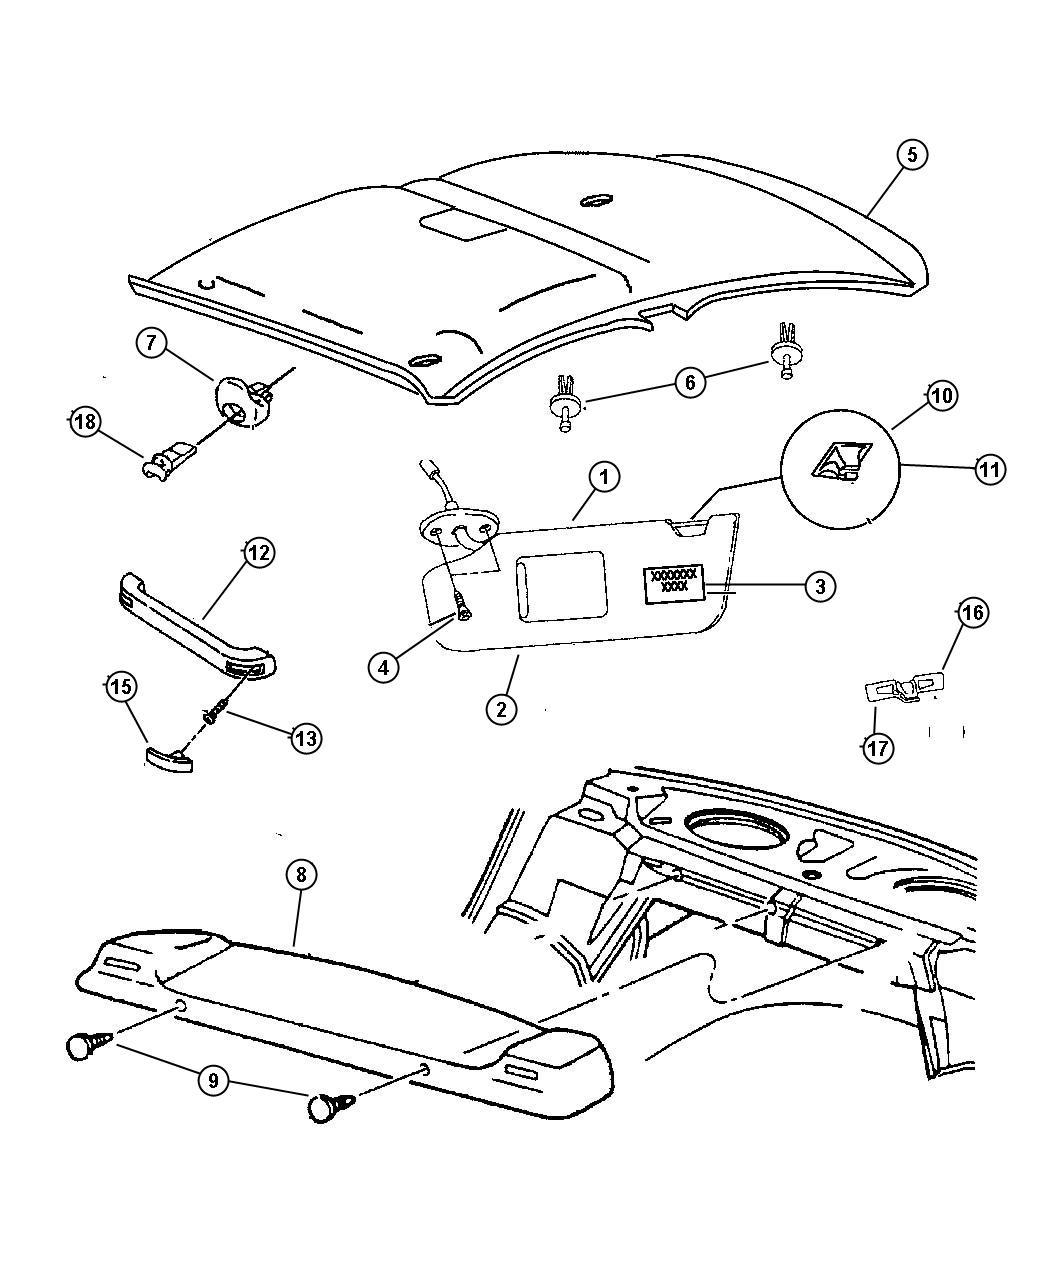 2017 Chrysler PACIFICA L HYBRID Screw. Pan Head. M6x1x20